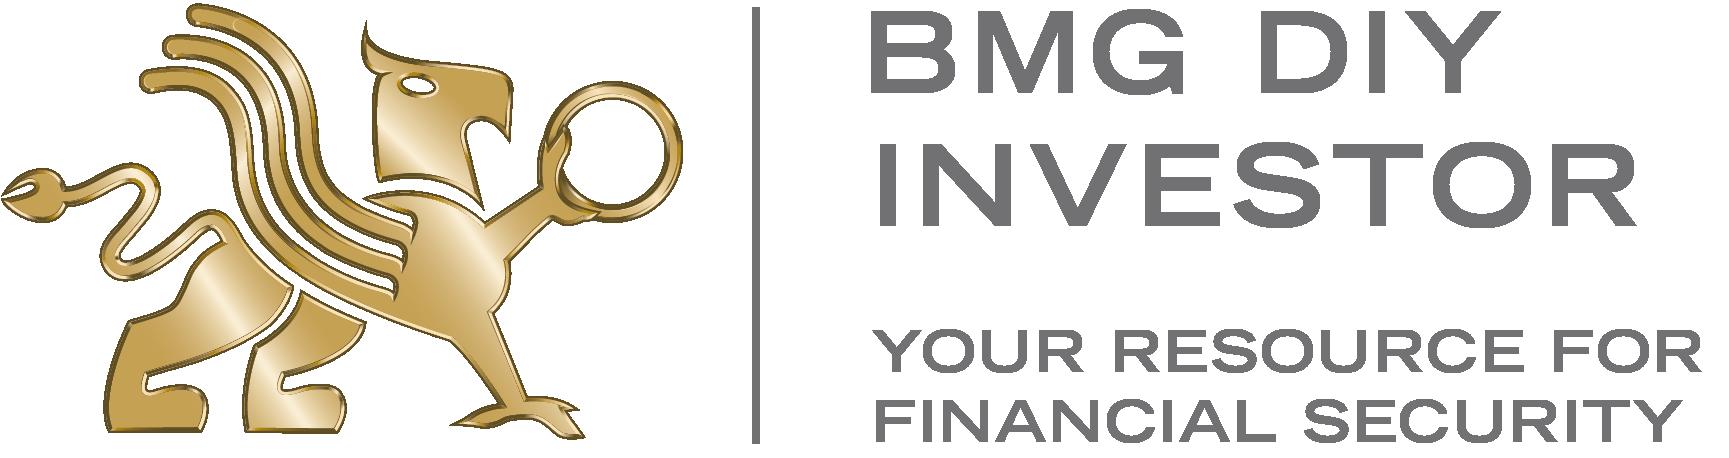 BMG DIY Investor